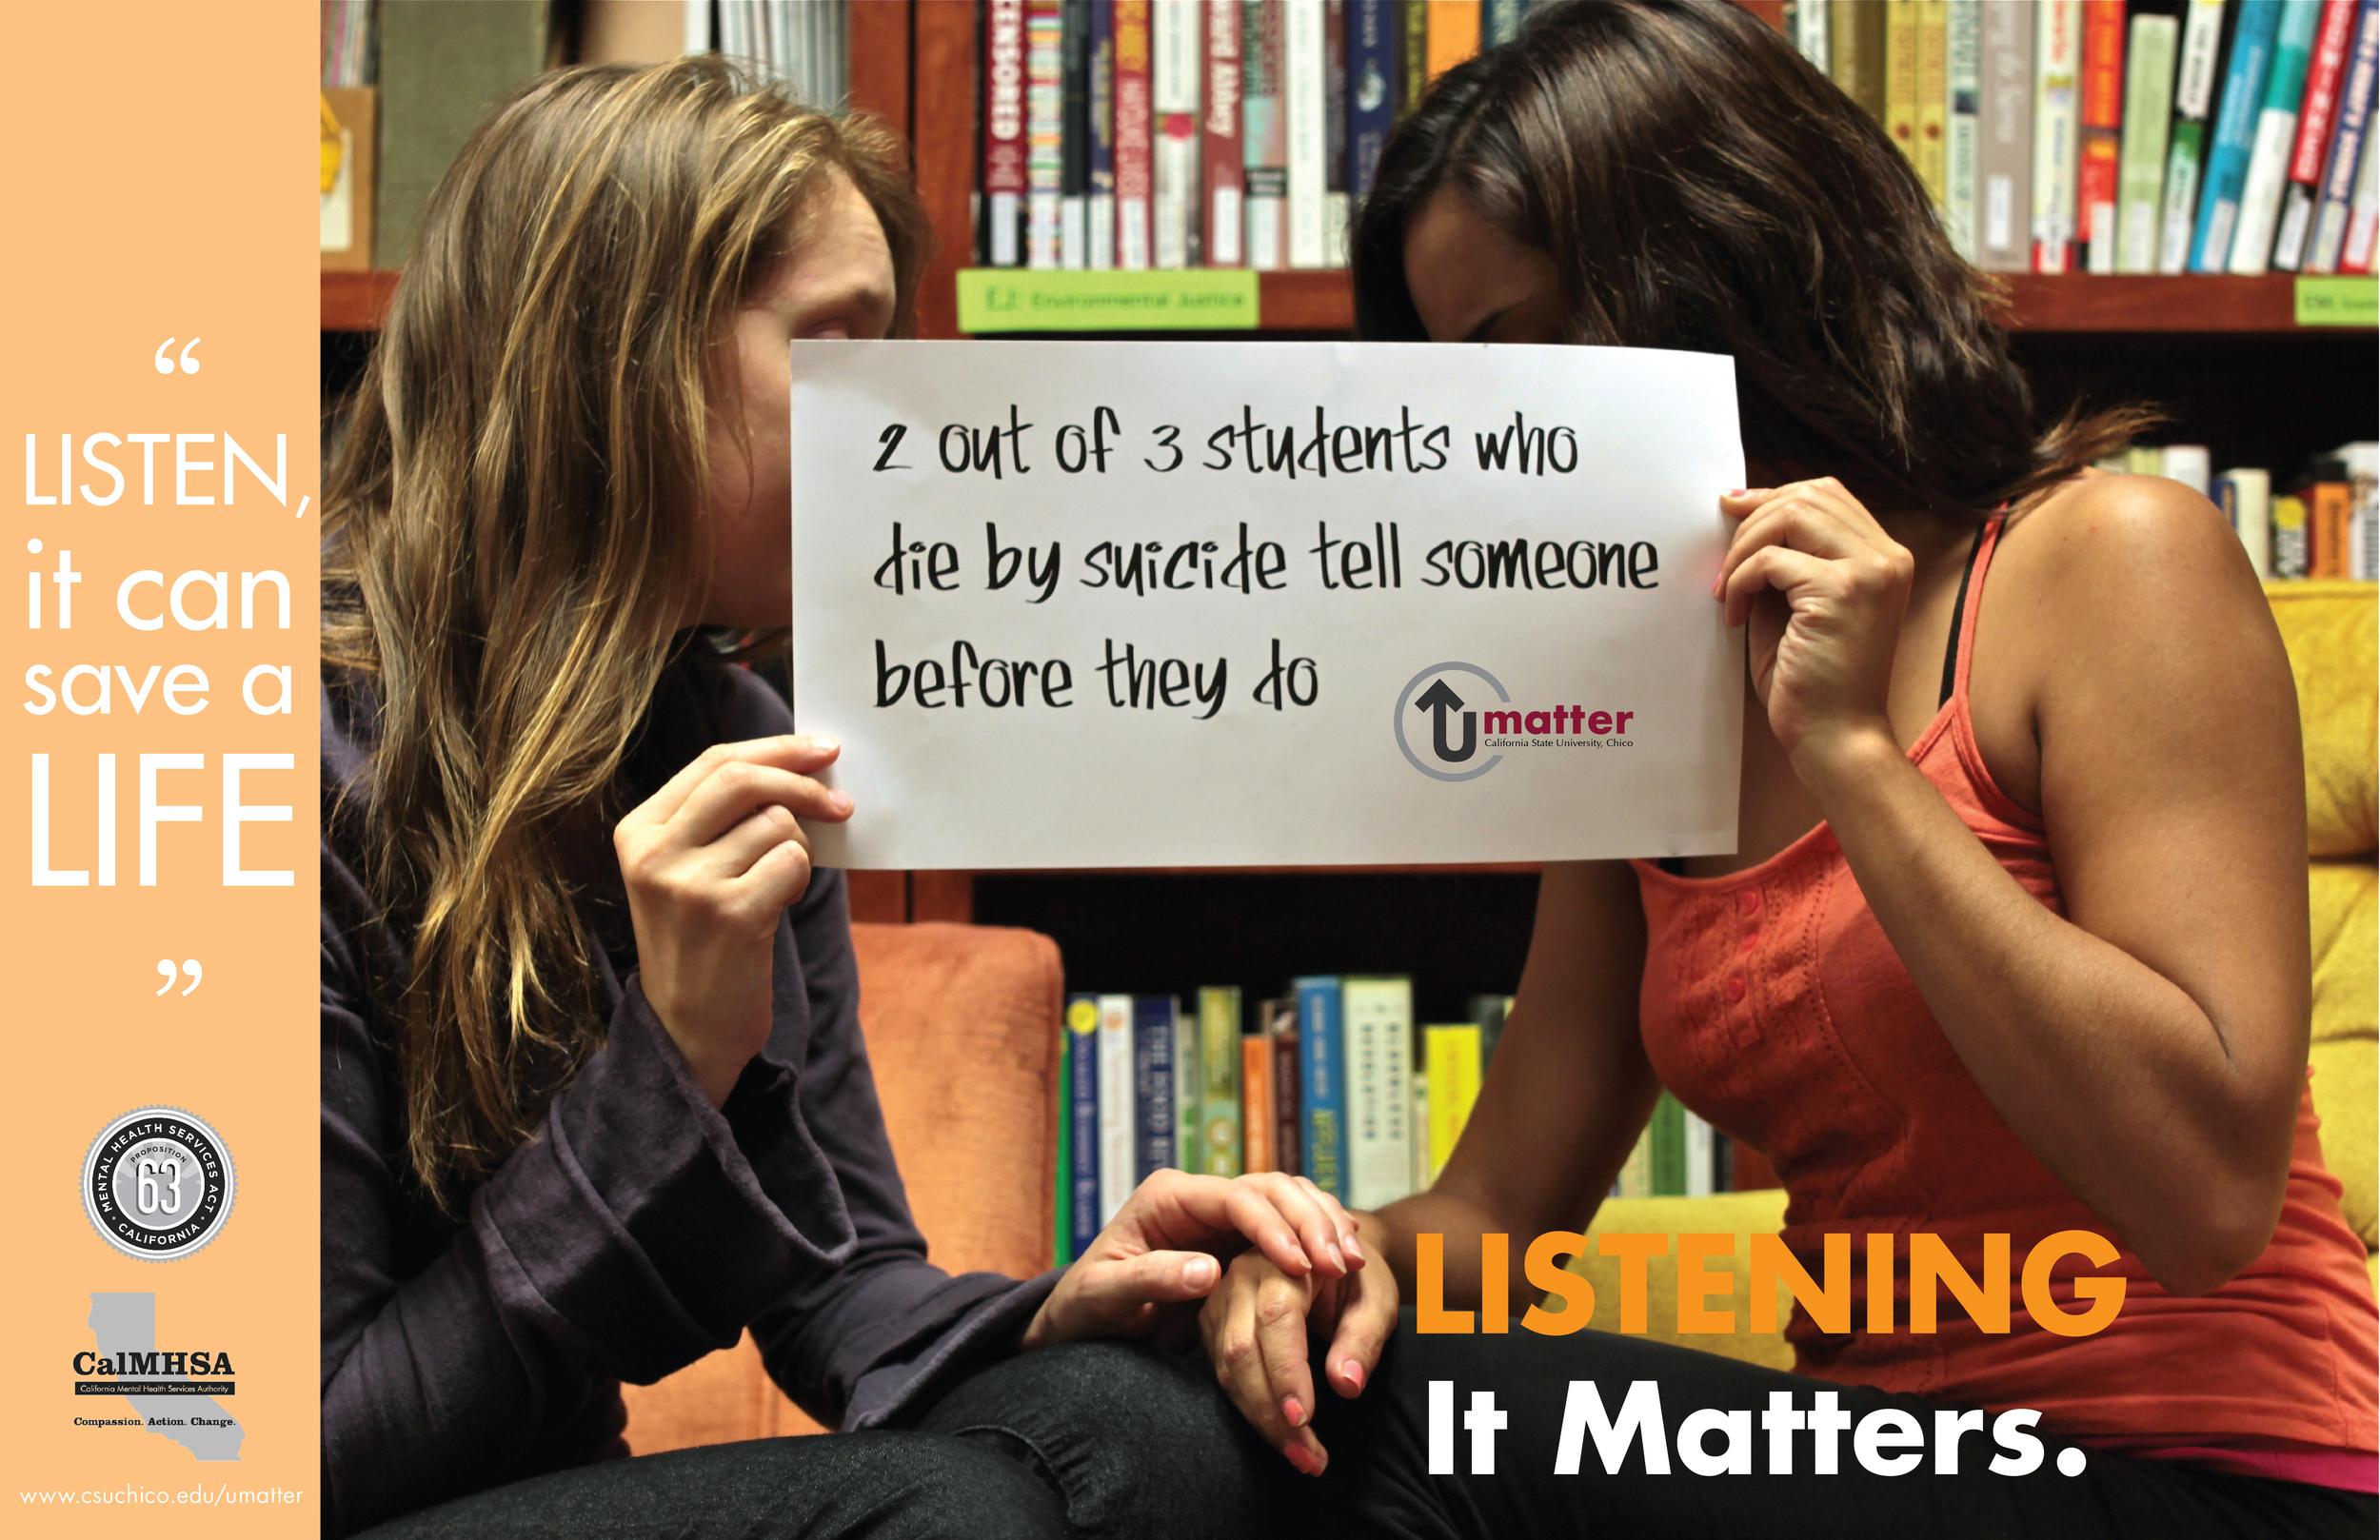 LISTENING_UMatter-01.jpg